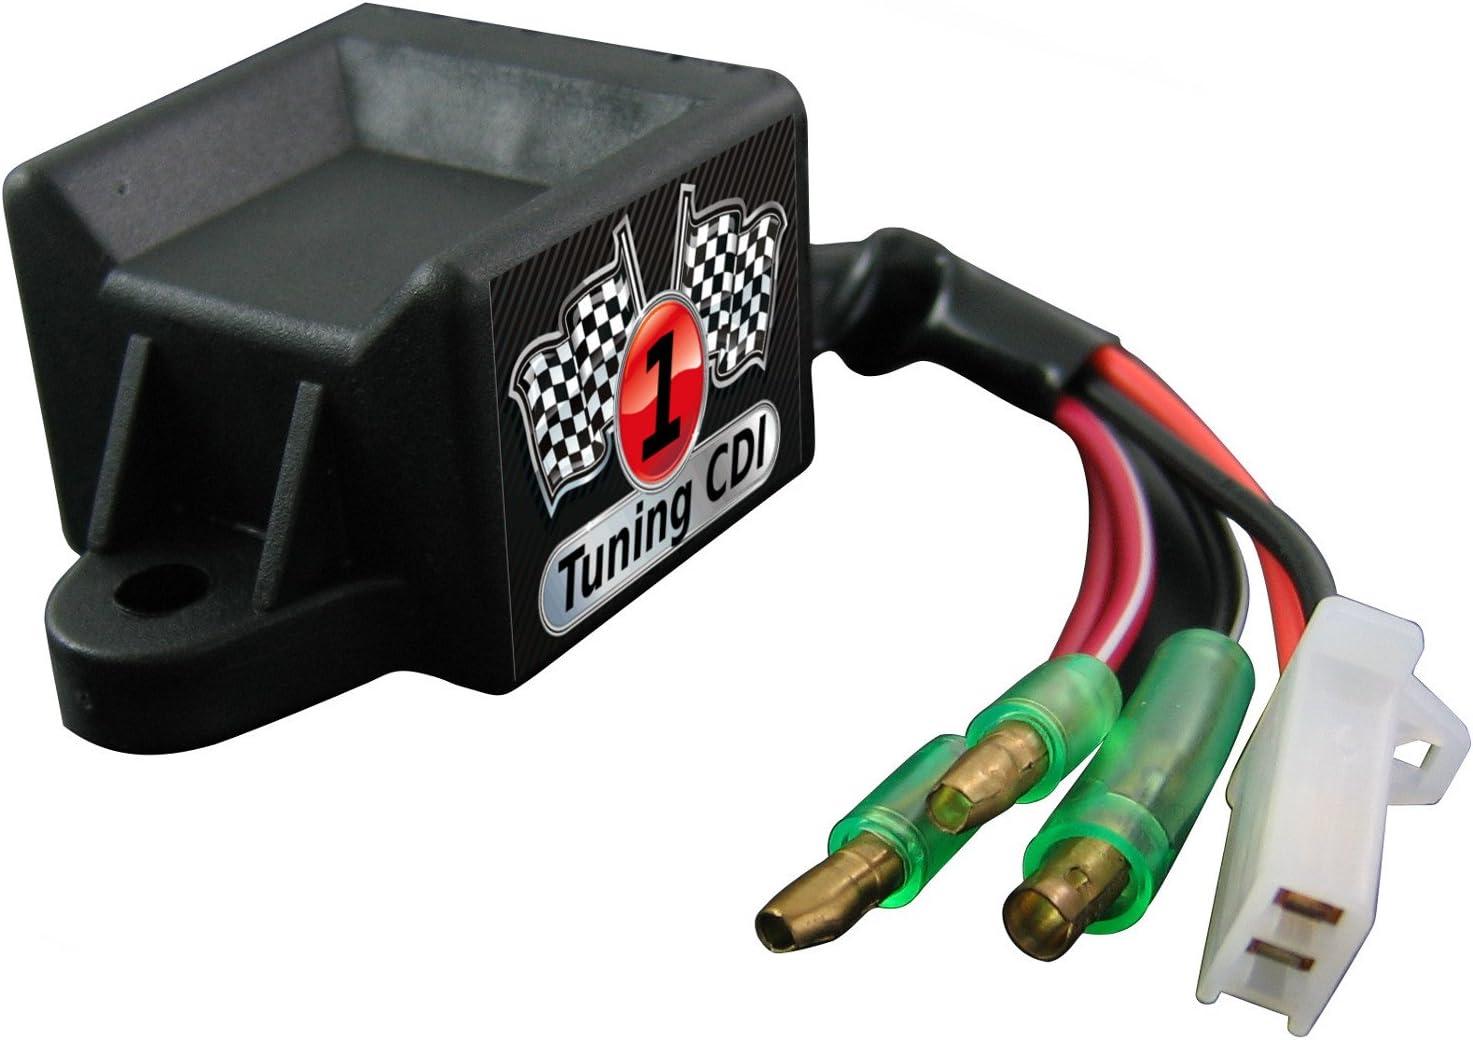 603/50/ccm//motomojo Roadster 50/2T//Aeon Cobra 50, ouverte Sport Tuning CDI Dinli DL 601